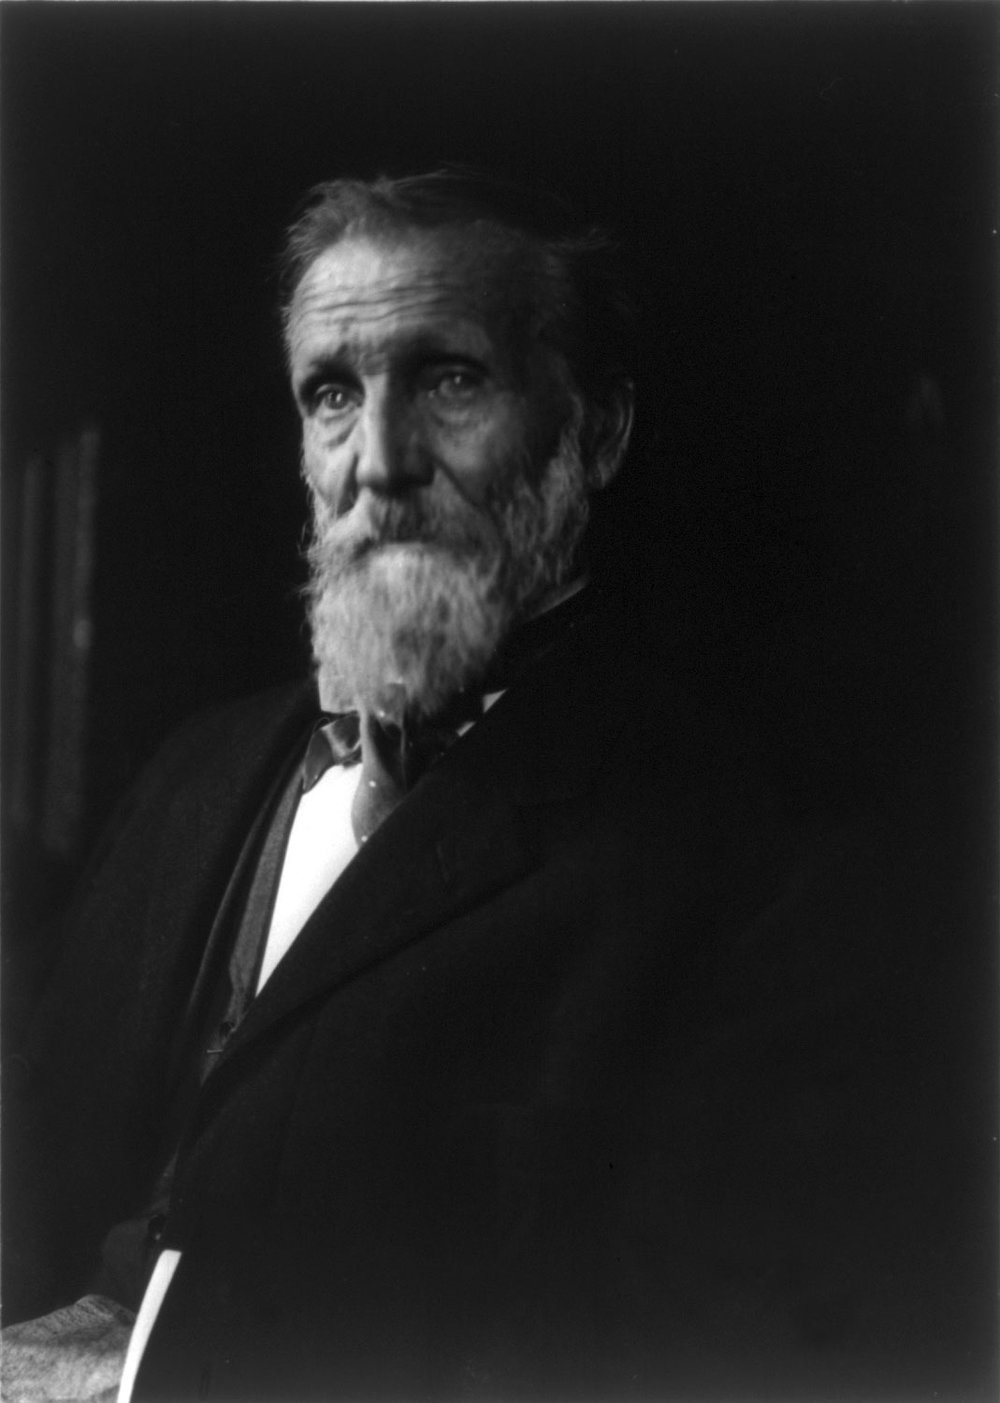 Elder John Muir